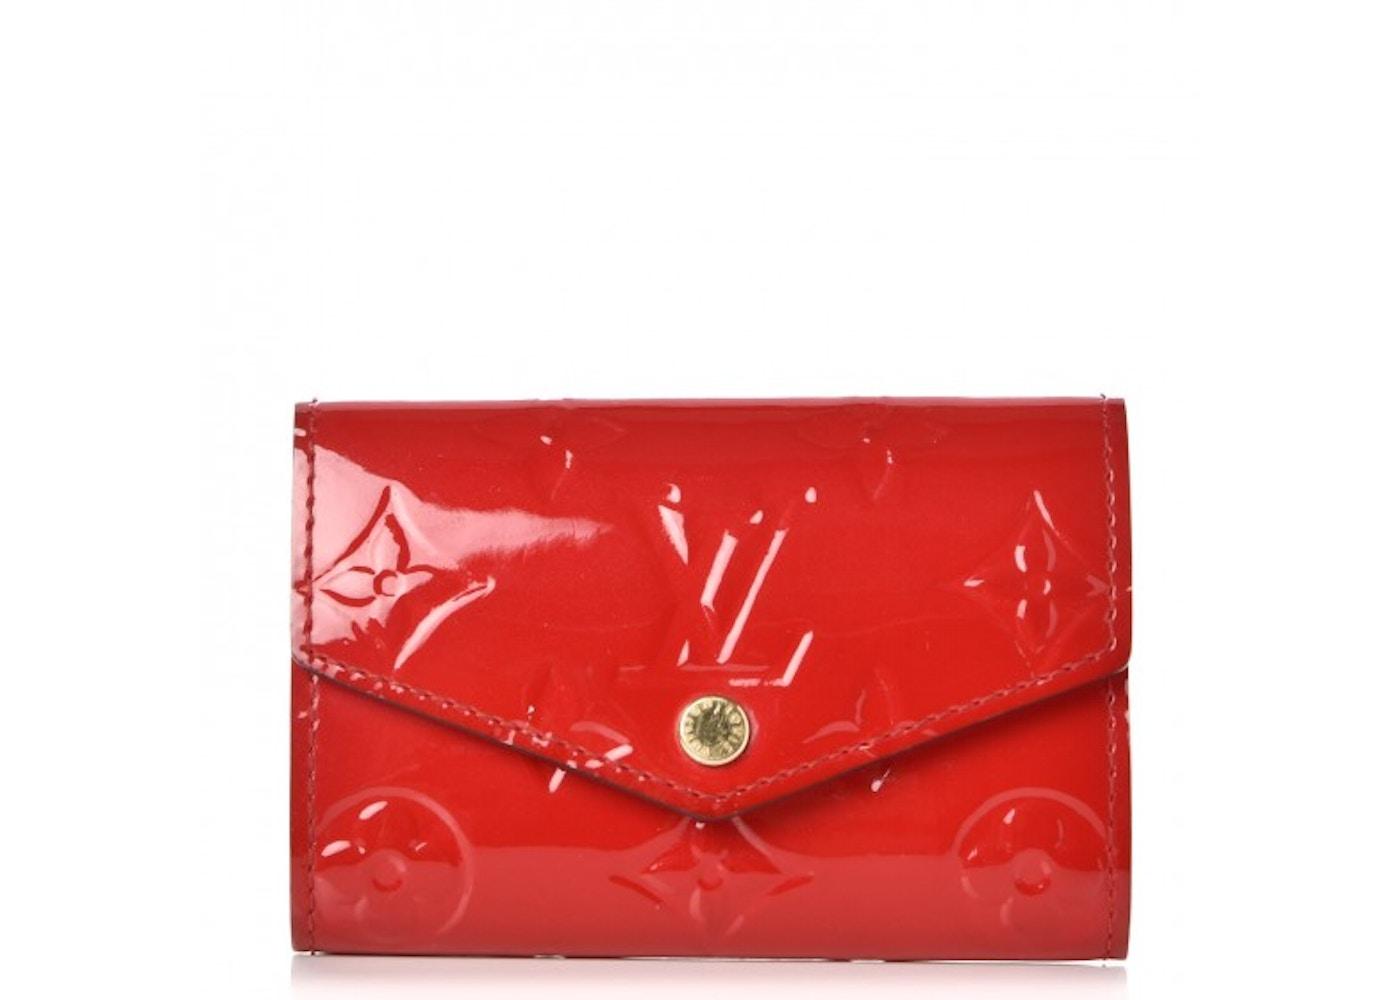 86687b8a0b Louis Vuitton Key Holder Multicles 6 Monogram Vernis Cerise Cherry